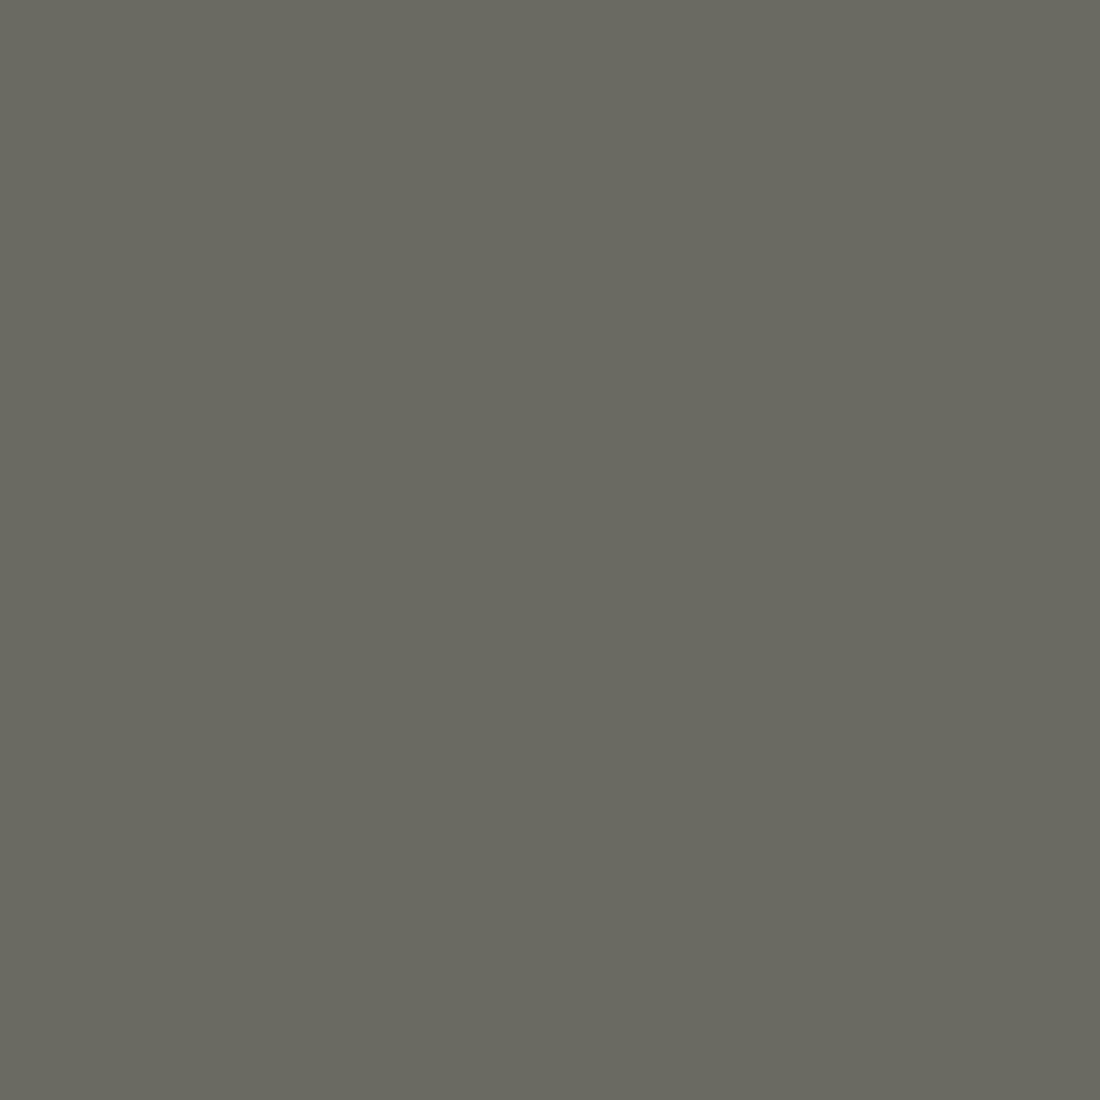 Trespa® Izeon® HPL Plaat EZ Grijs quartz RAL7039 Enkelzijdig folie 3050x1530x6mm